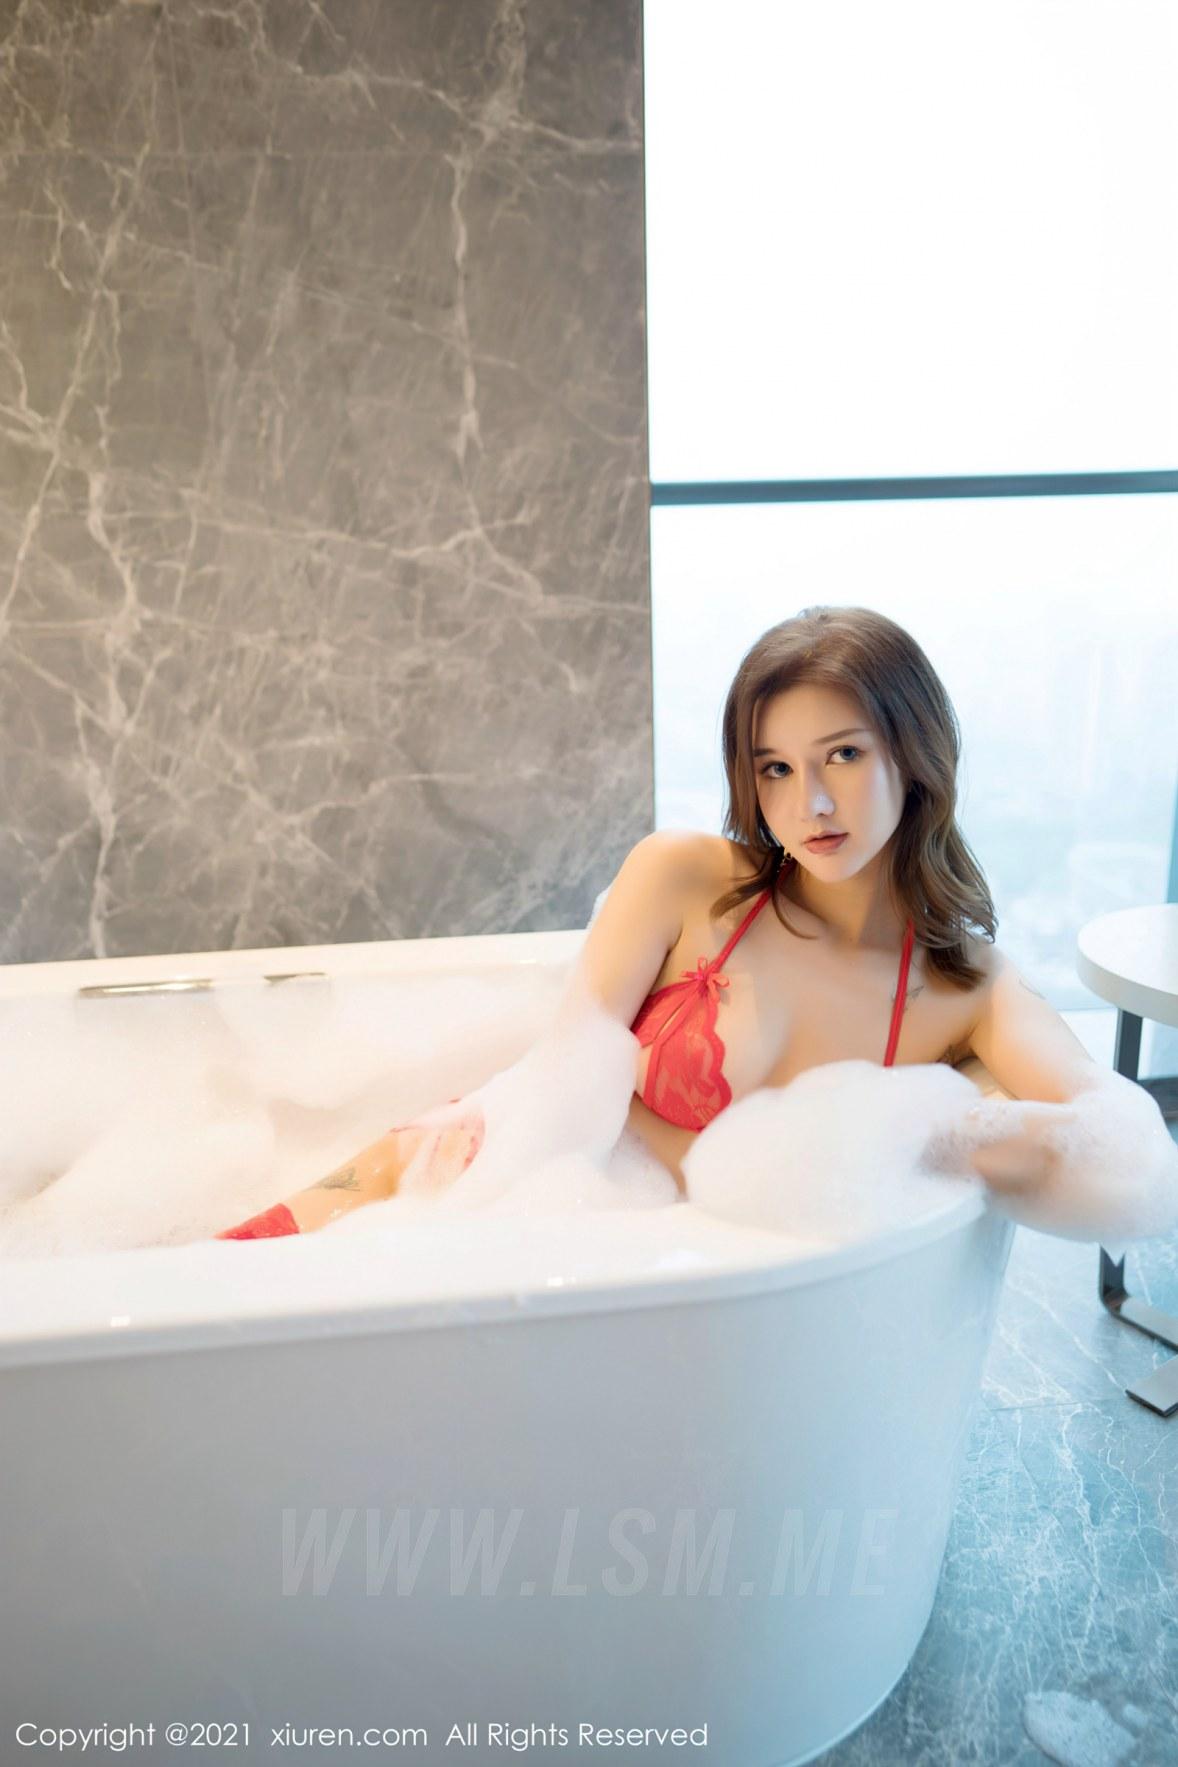 403 030 pxj 3600 5400 - FeiLin 嗲囡囡 Vol.403 浴室泡泡浴 文芮jeninfer 性感写真 - 嗲囡囡 -【免费在线写真】【丽人丝语】